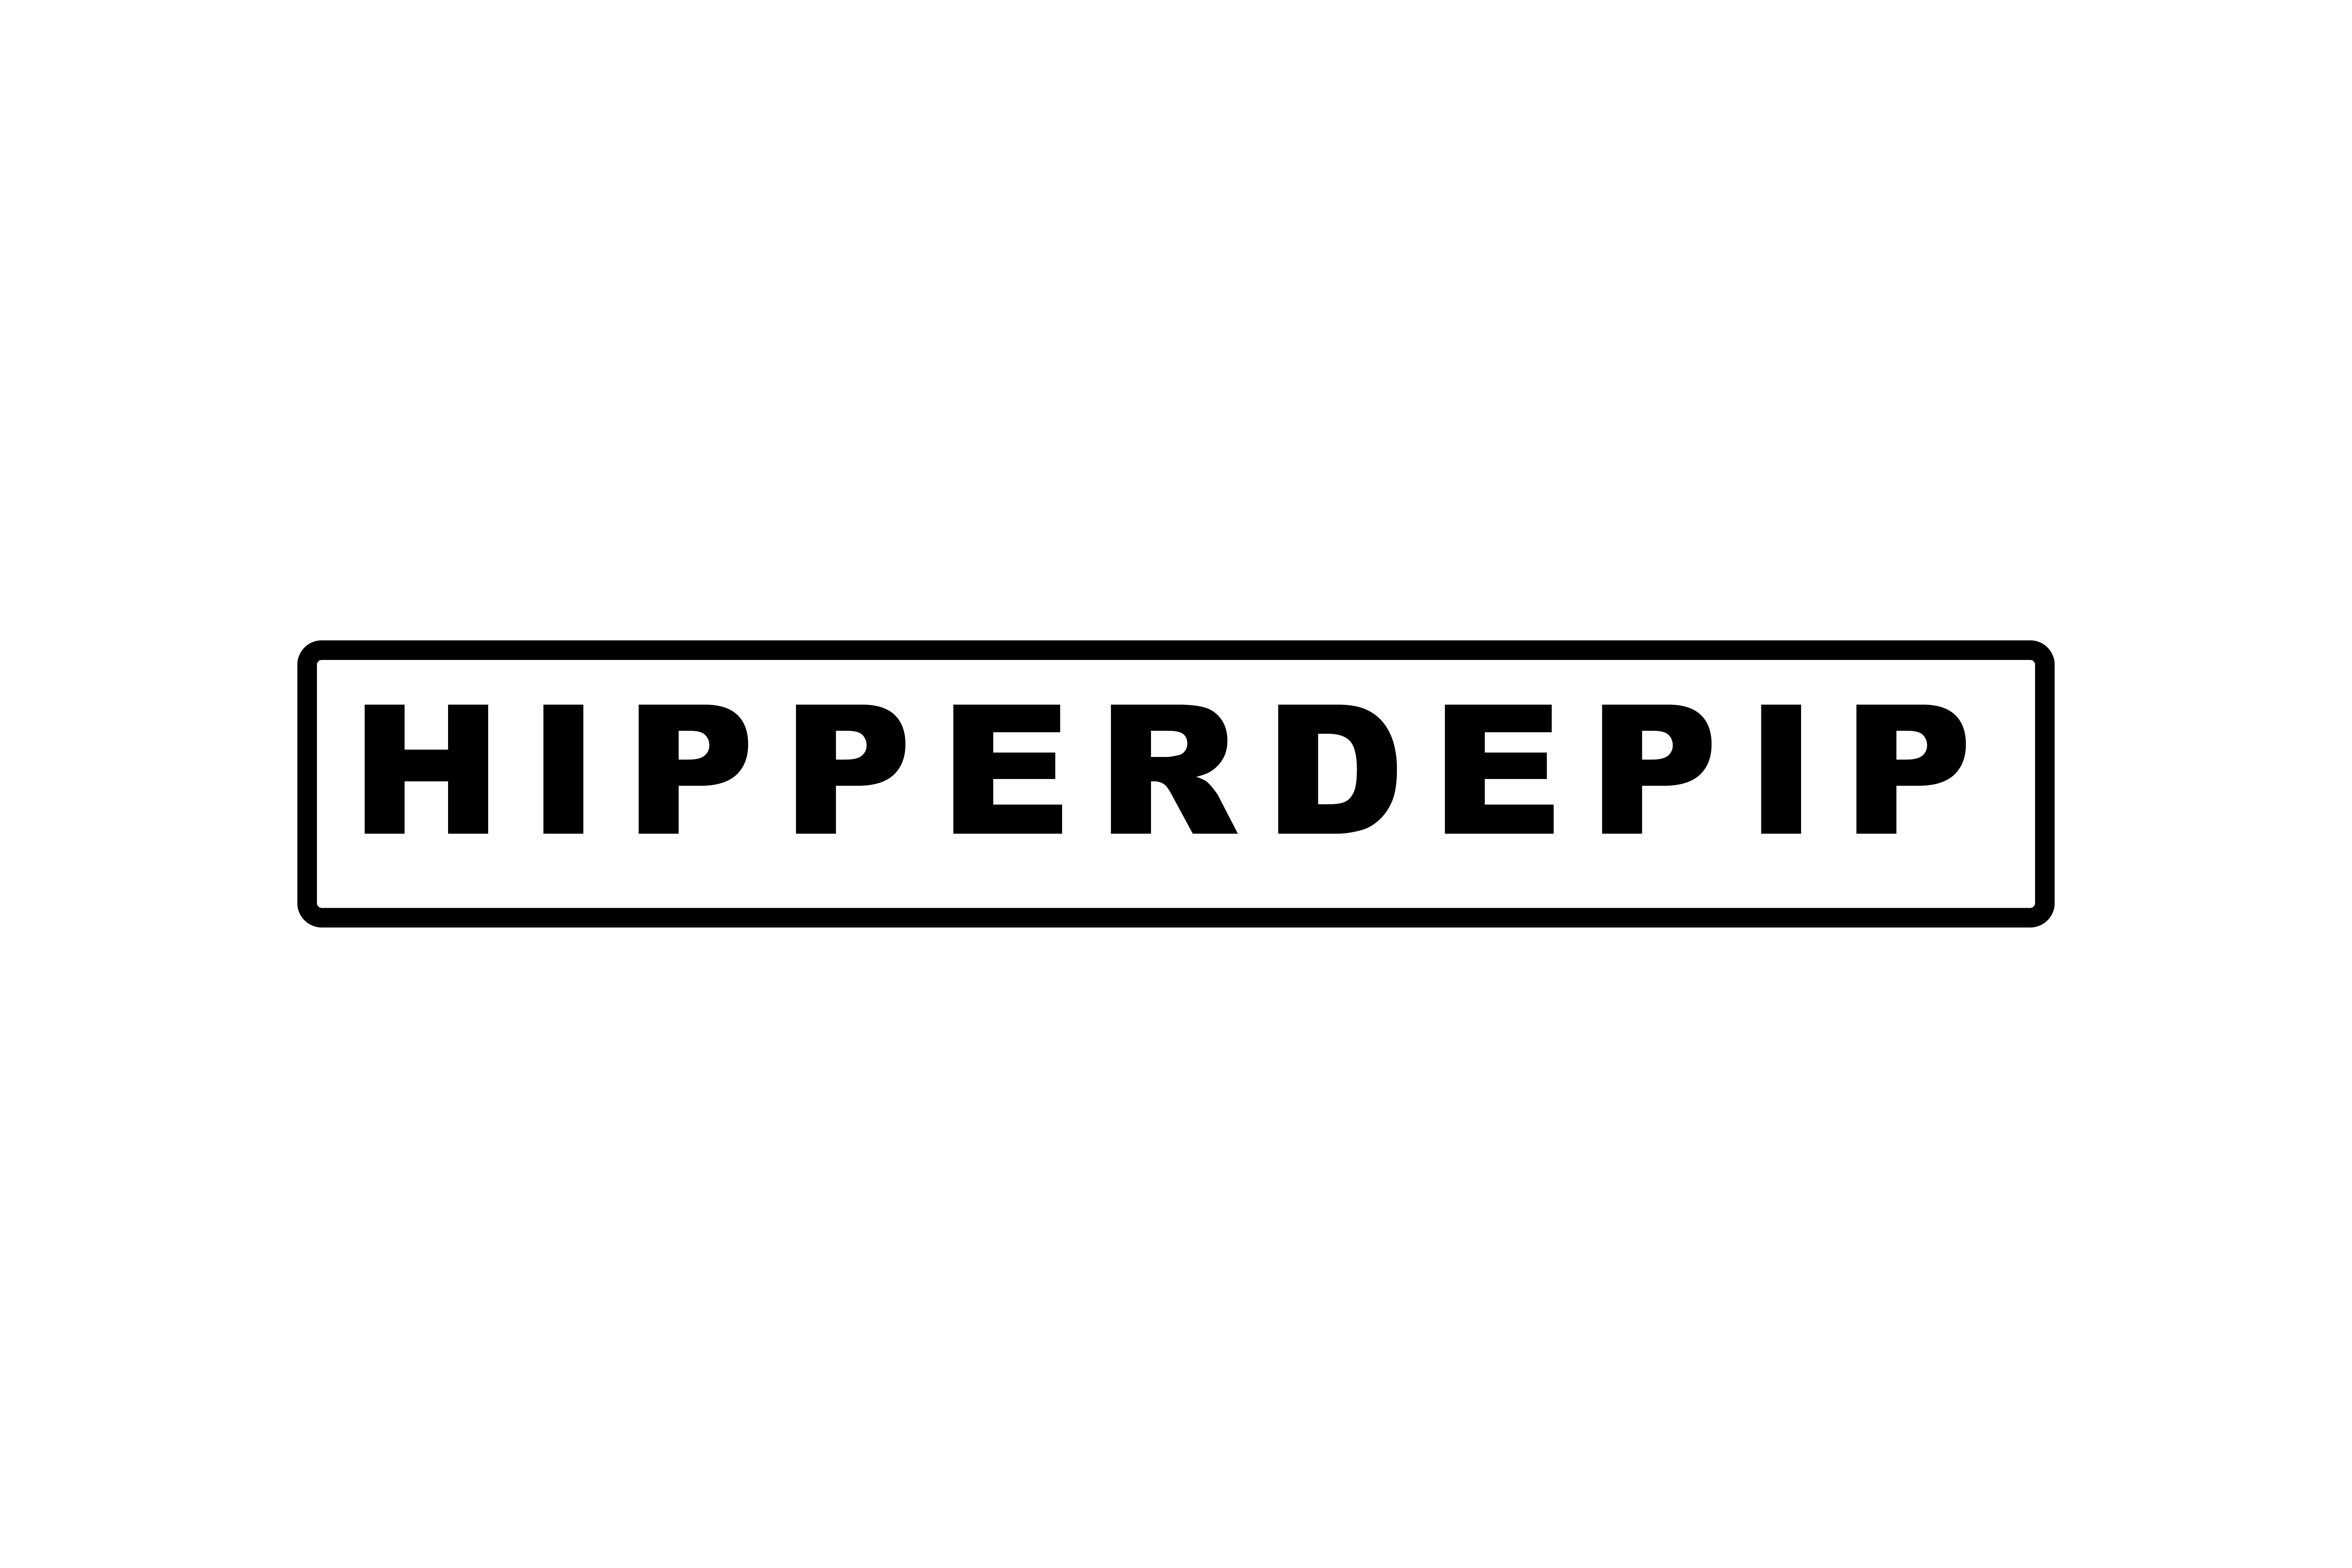 hipperdepip